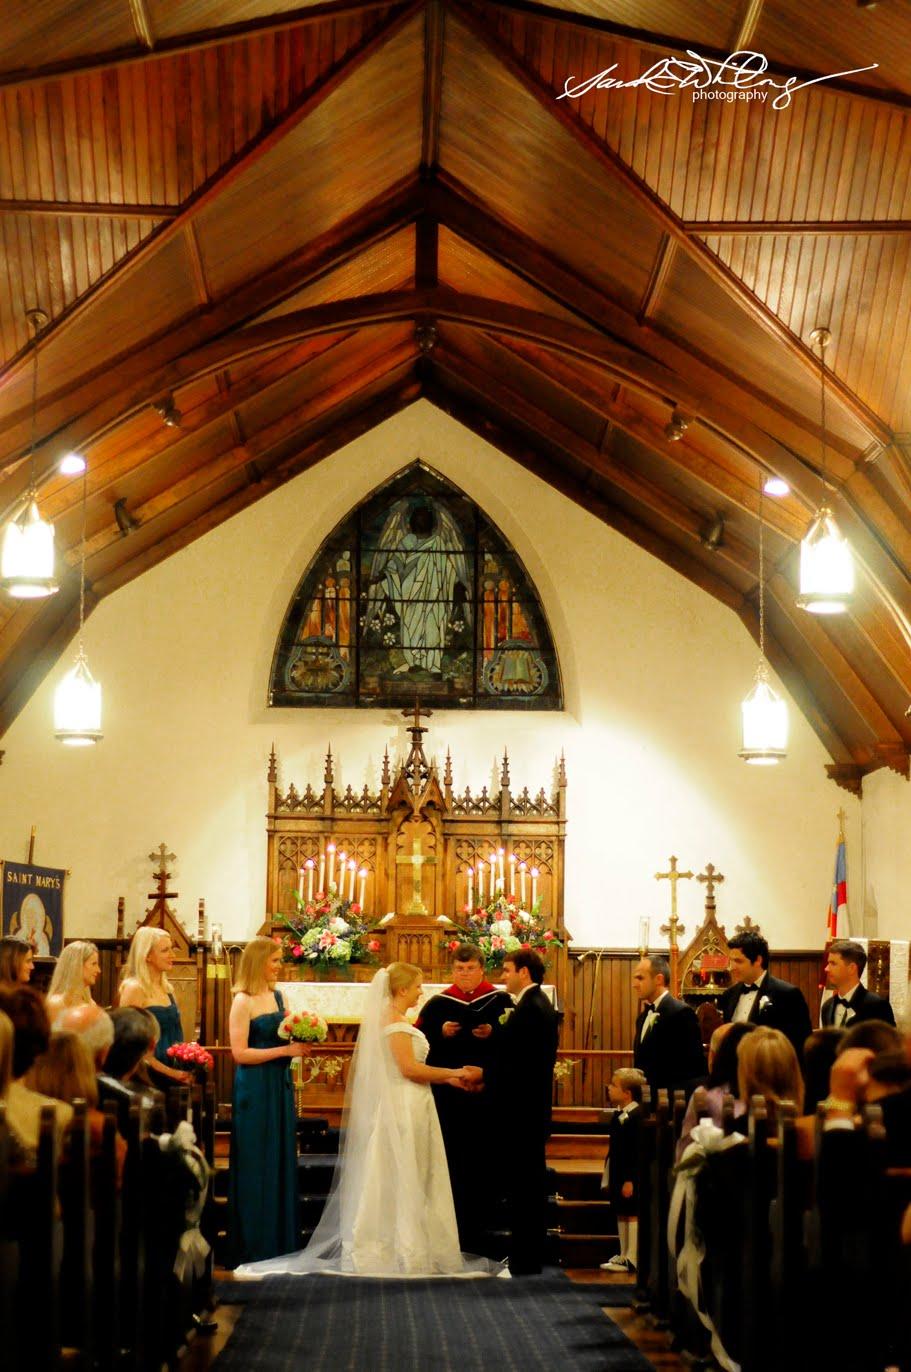 escort i Jylland sisters chapel næstved